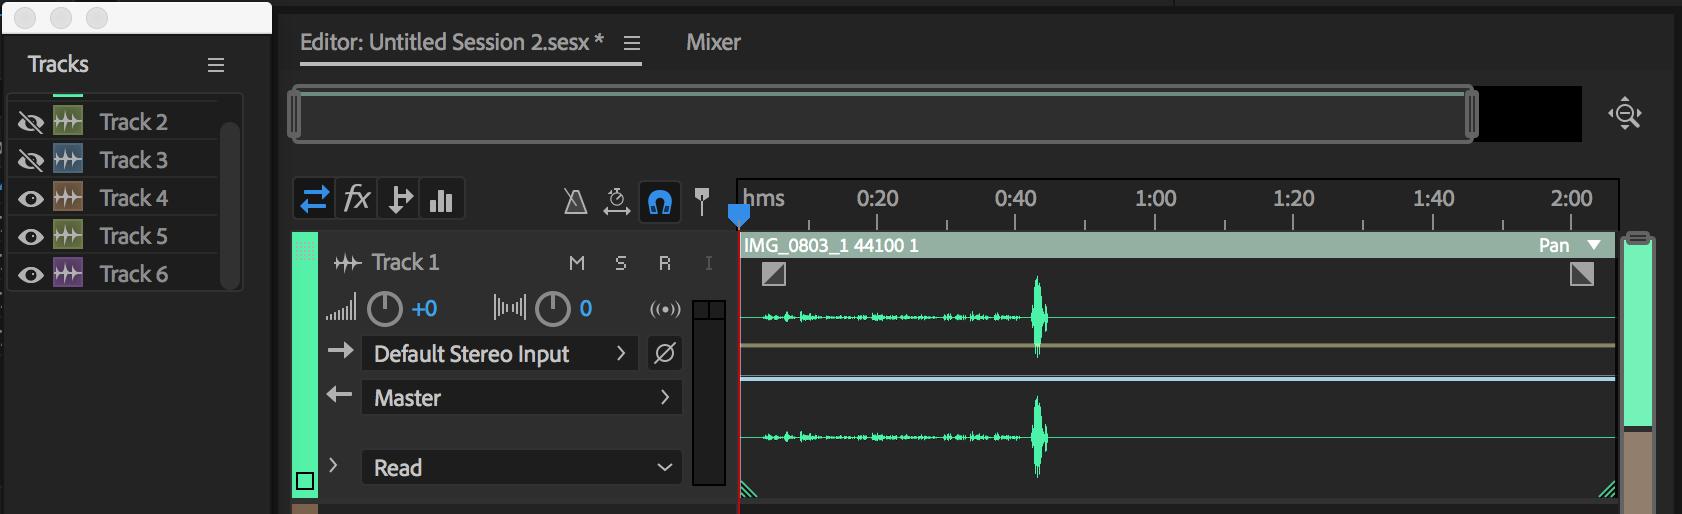 Use basic multitrack controls for Adobe Audition